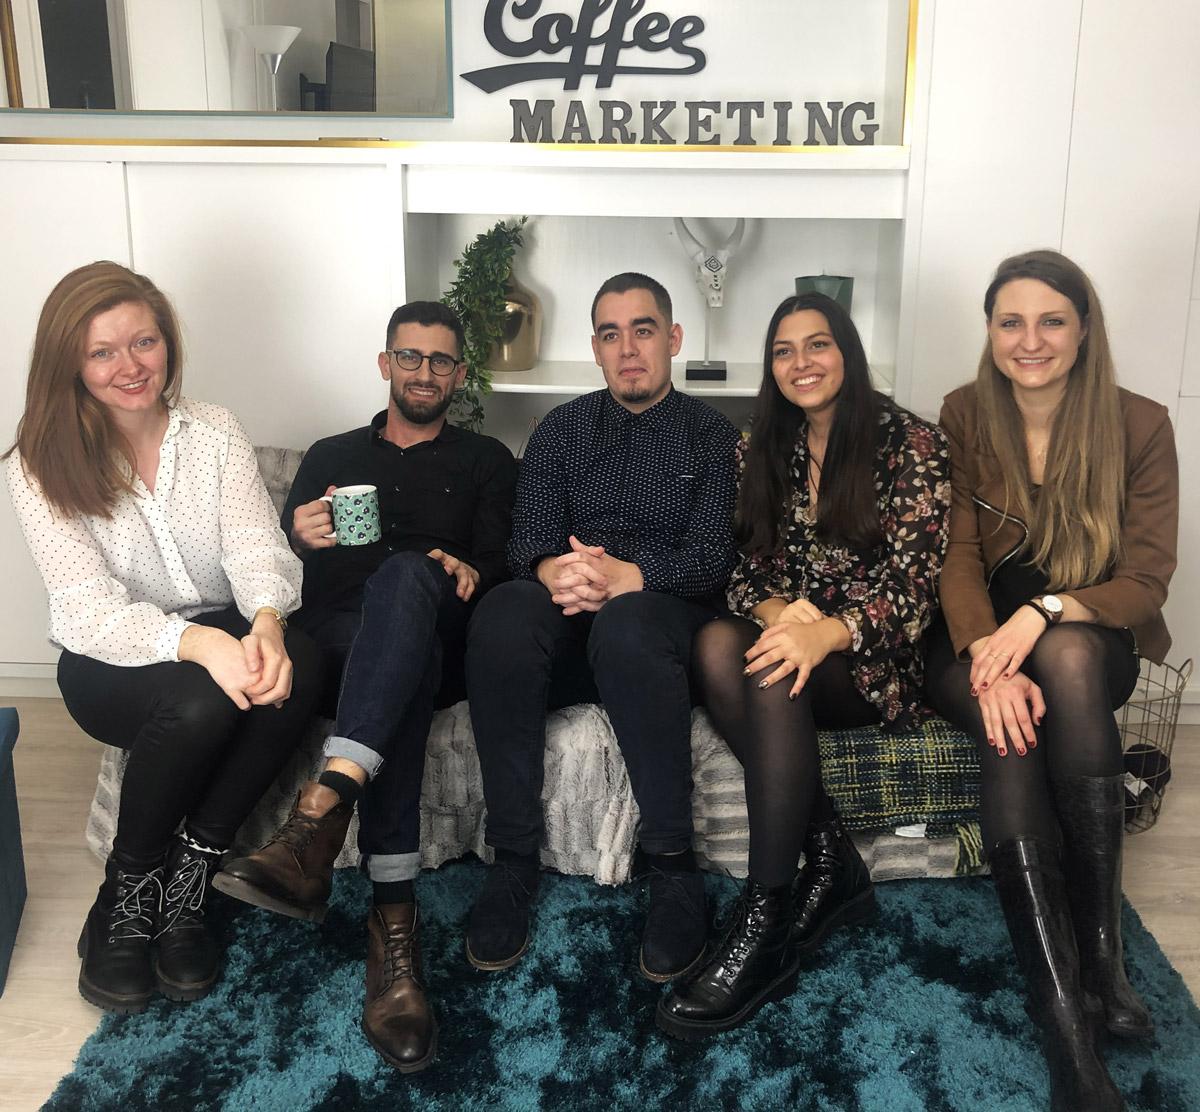 Team Coffee avant 3